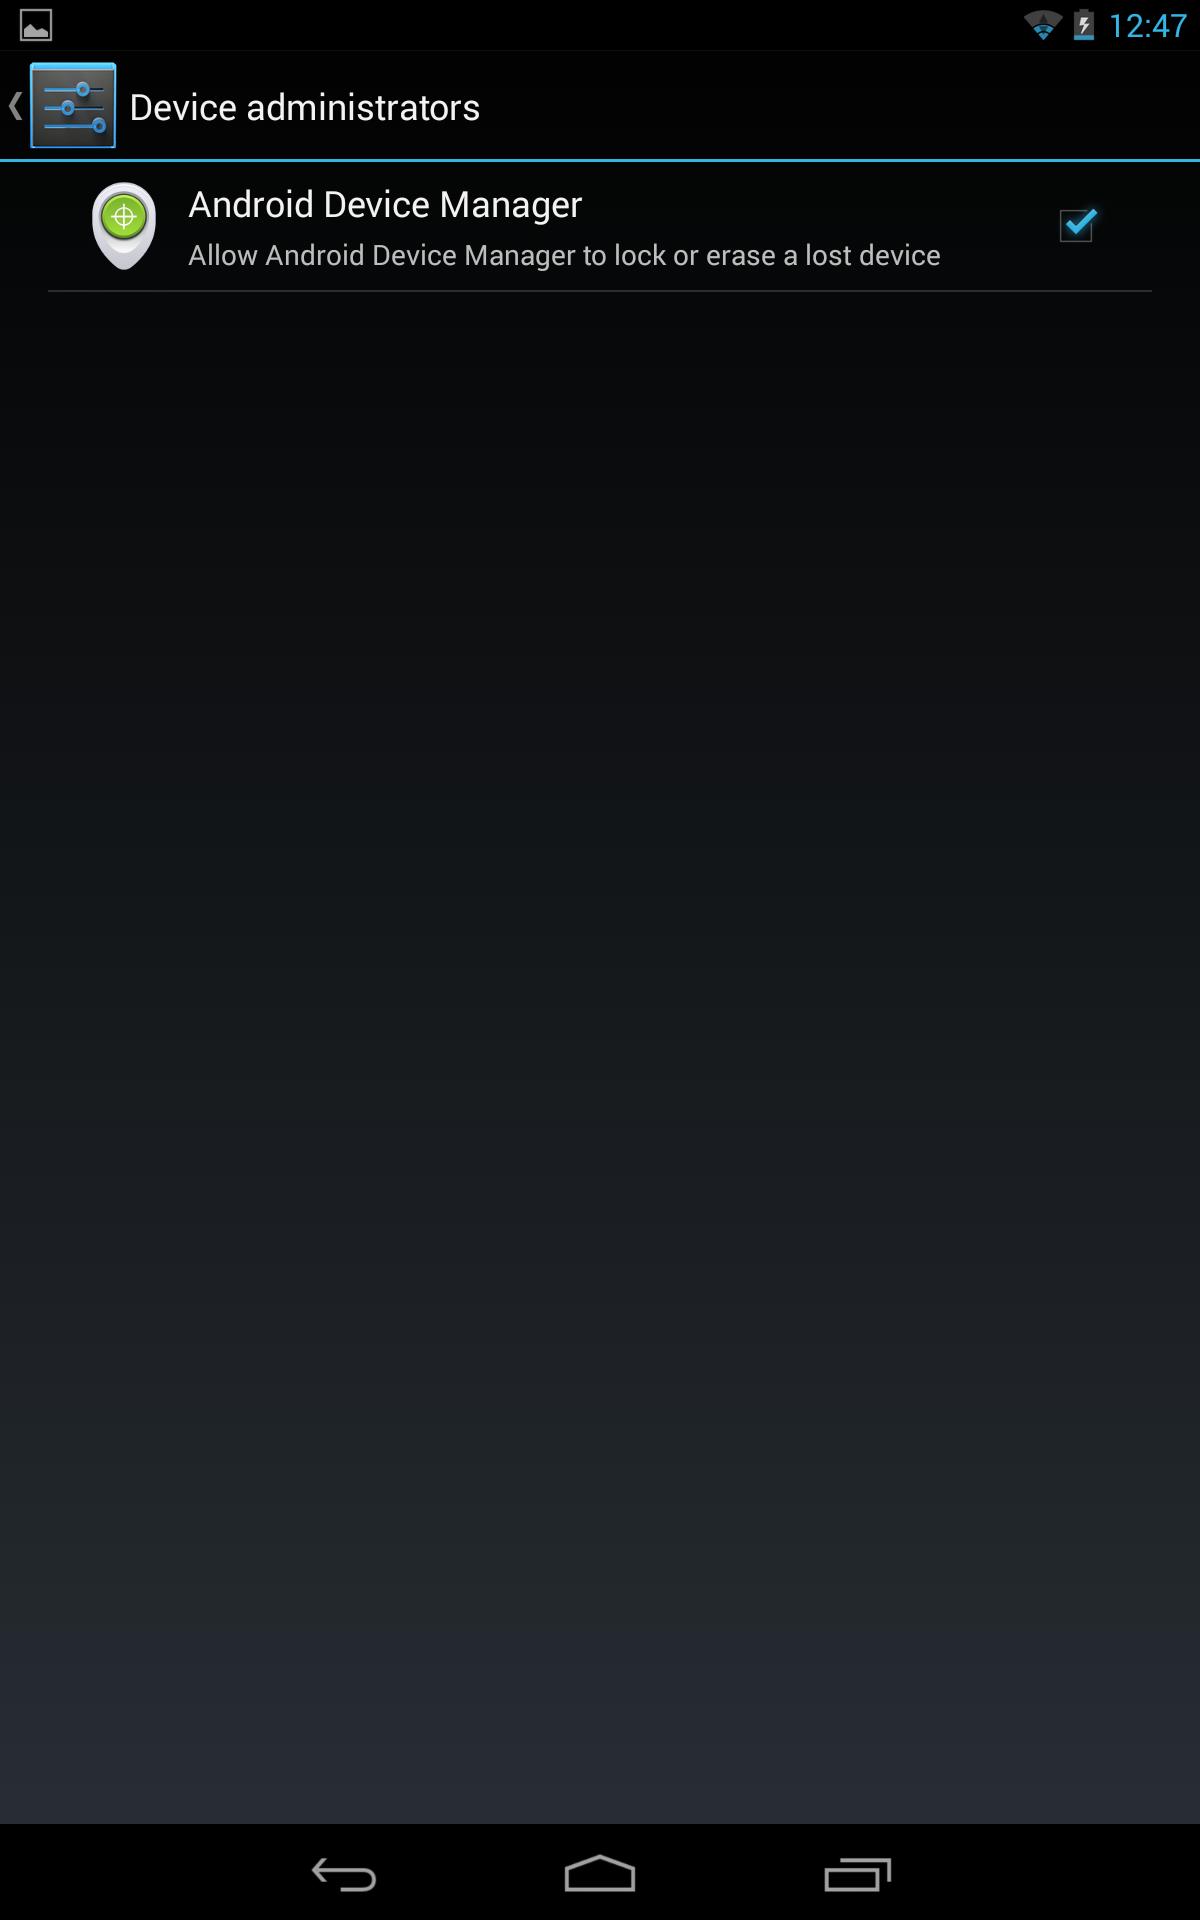 http://cdn.androidpolice.com/wp-content/uploads/2013/08/nexusae0_Screenshot_2013-08-03-12-47-26.png